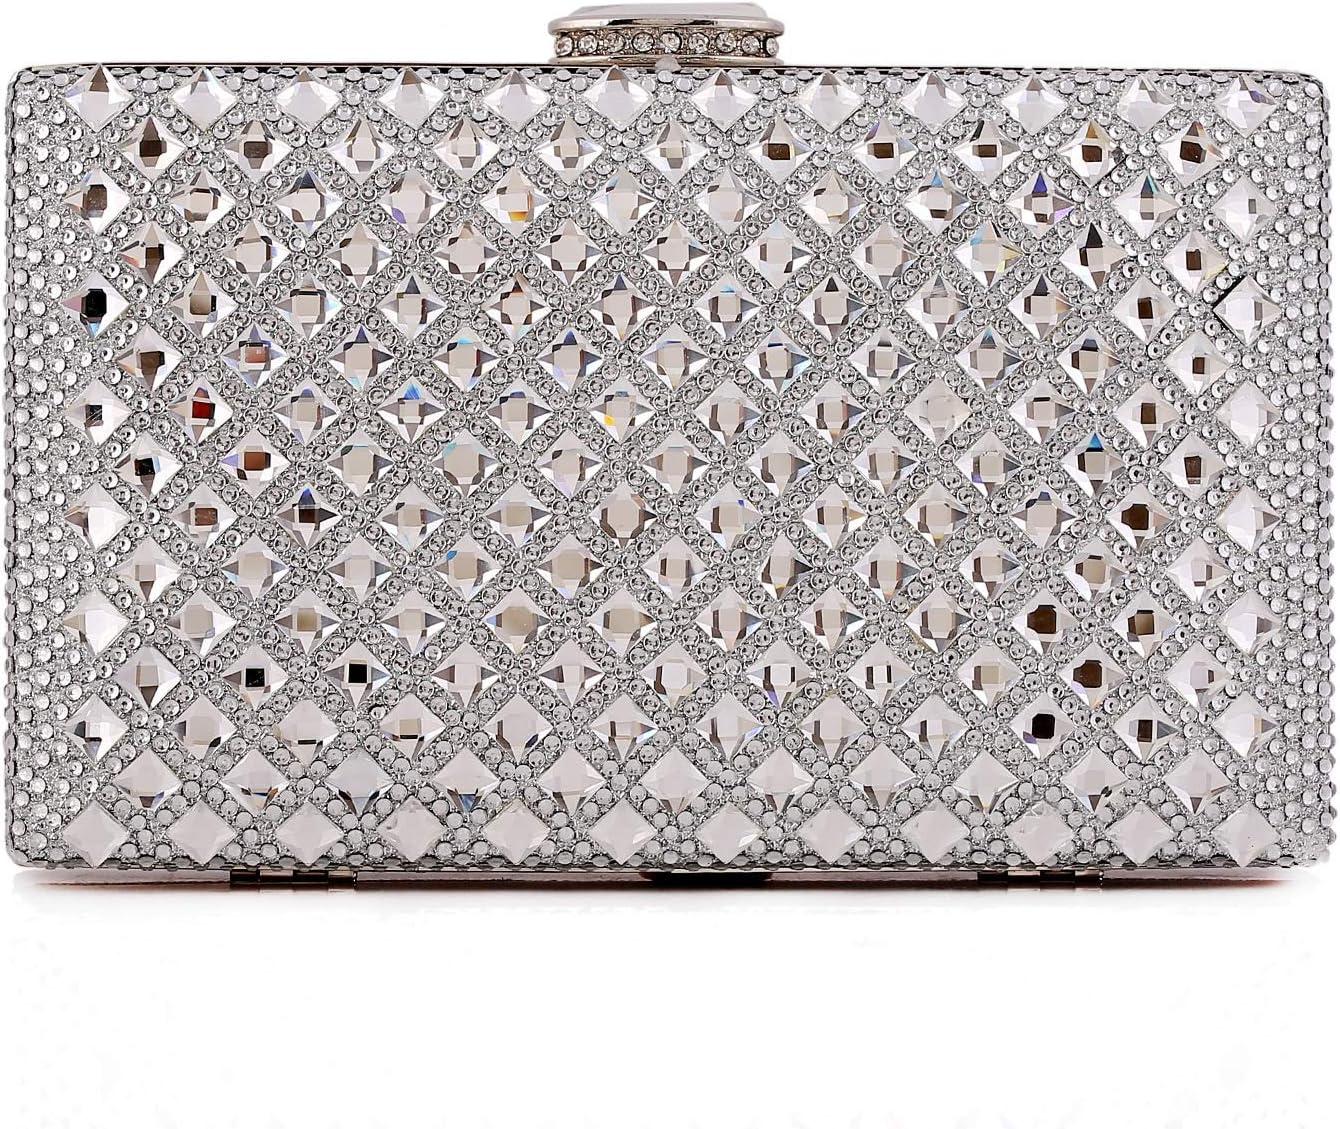 Color : Silver MATCHANT Handbag Tide Bag Luxury Diamond Shiny Clutch Dress Evening Party Bag Gold,Silver,Black